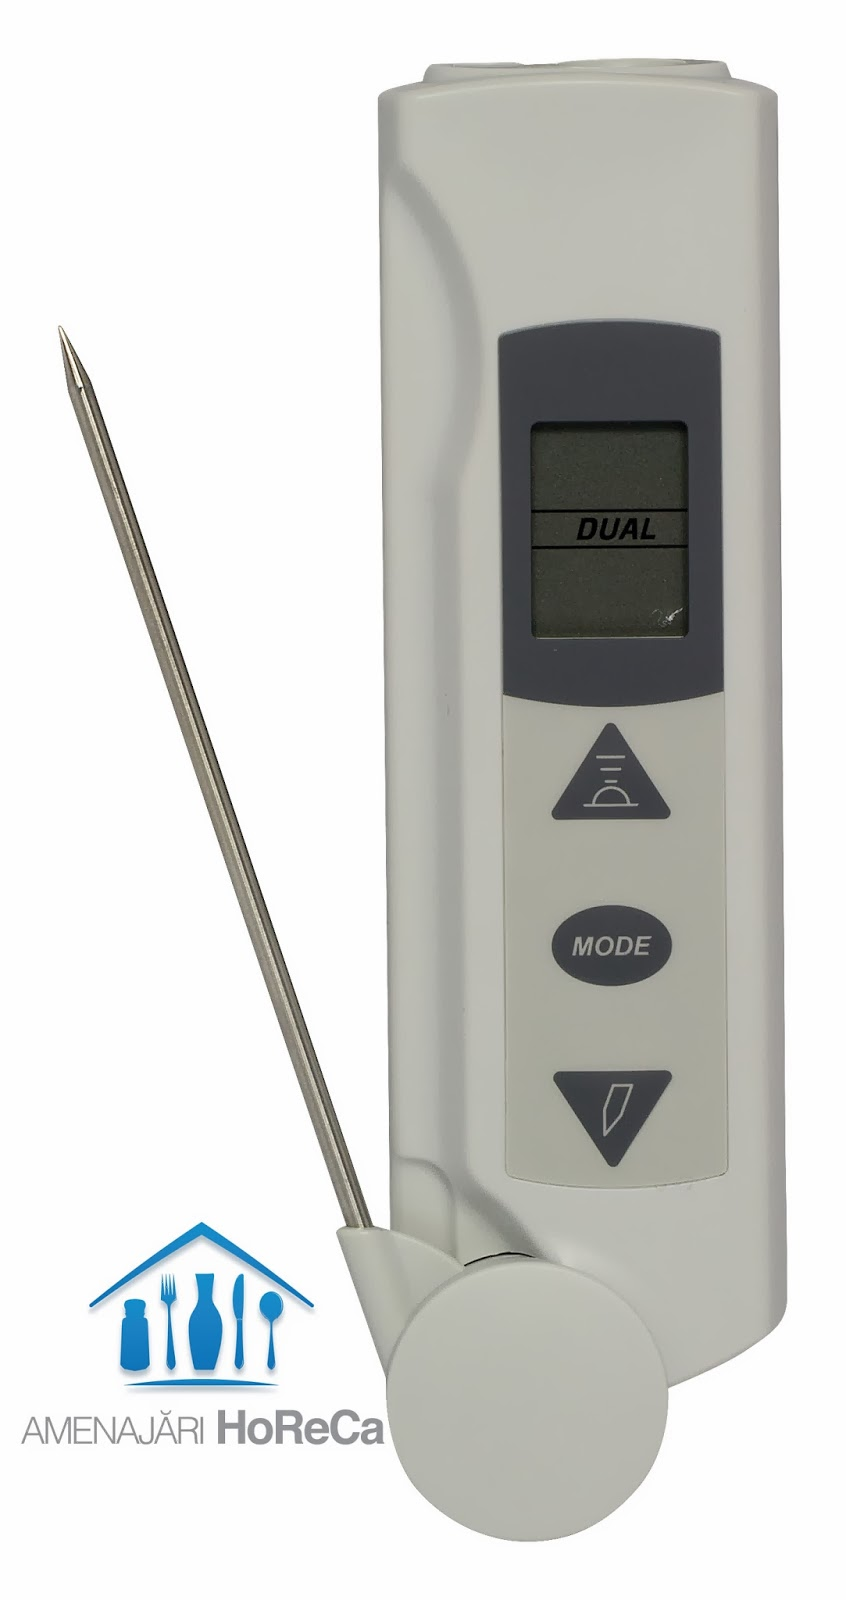 Termometru Infrarosu cu Sonda, Termometru Bucatarie, Pret Termometru, Accesorii Bucatarie